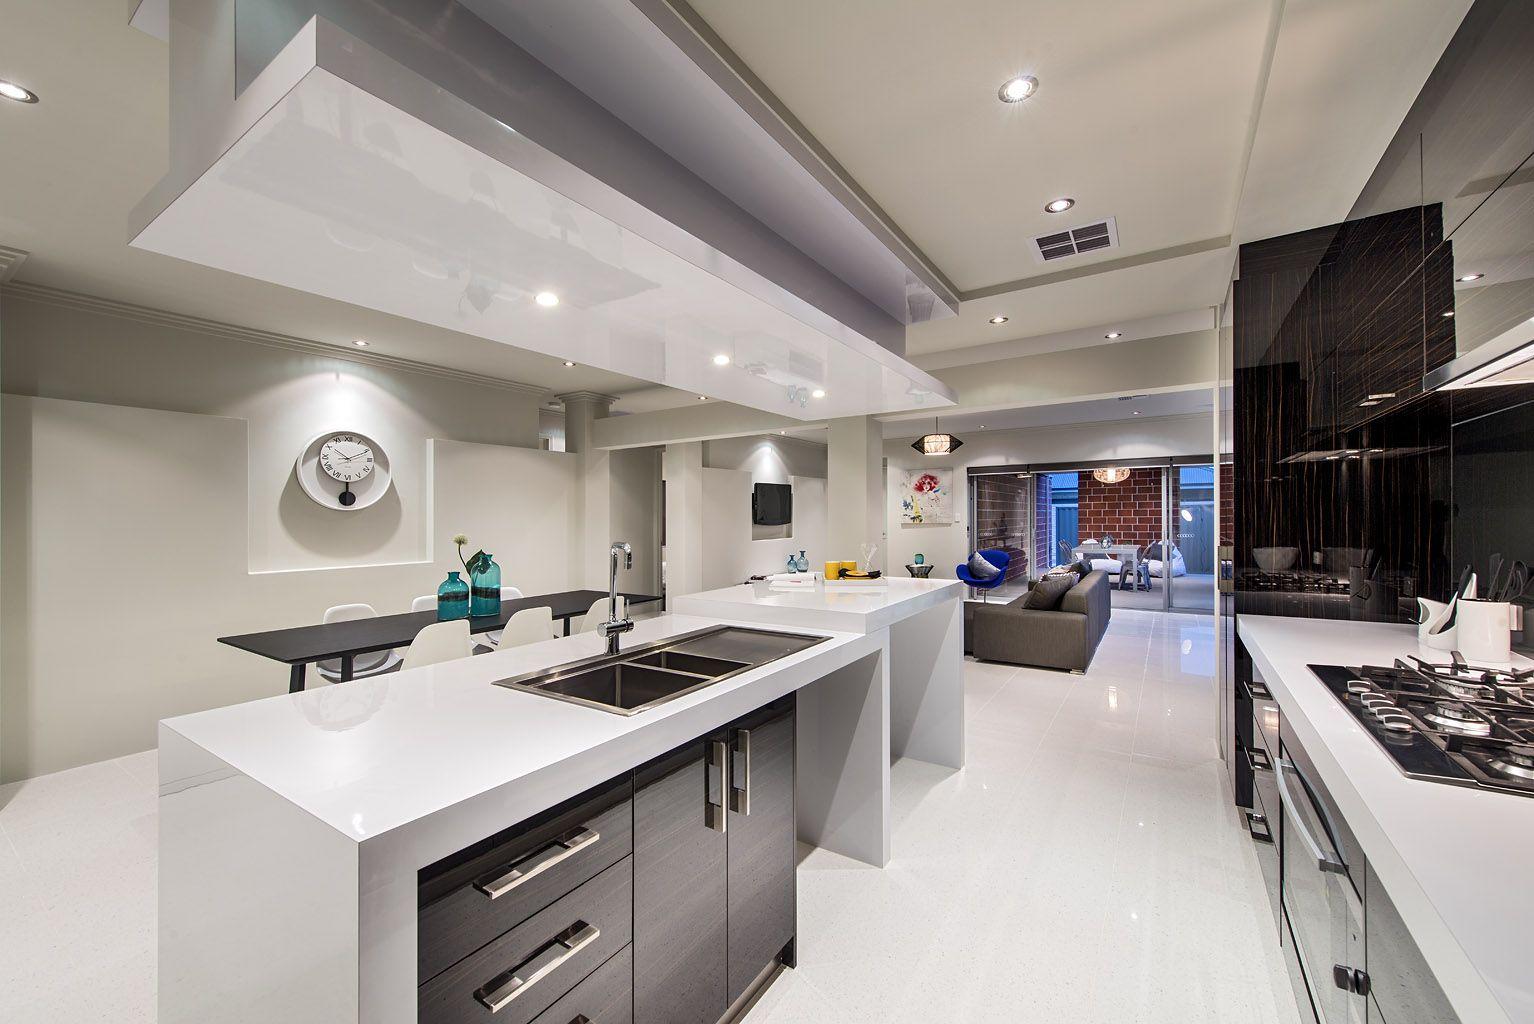 Kade Kitchen & Dining - WOW! Homes www.wowhomes.com.au/